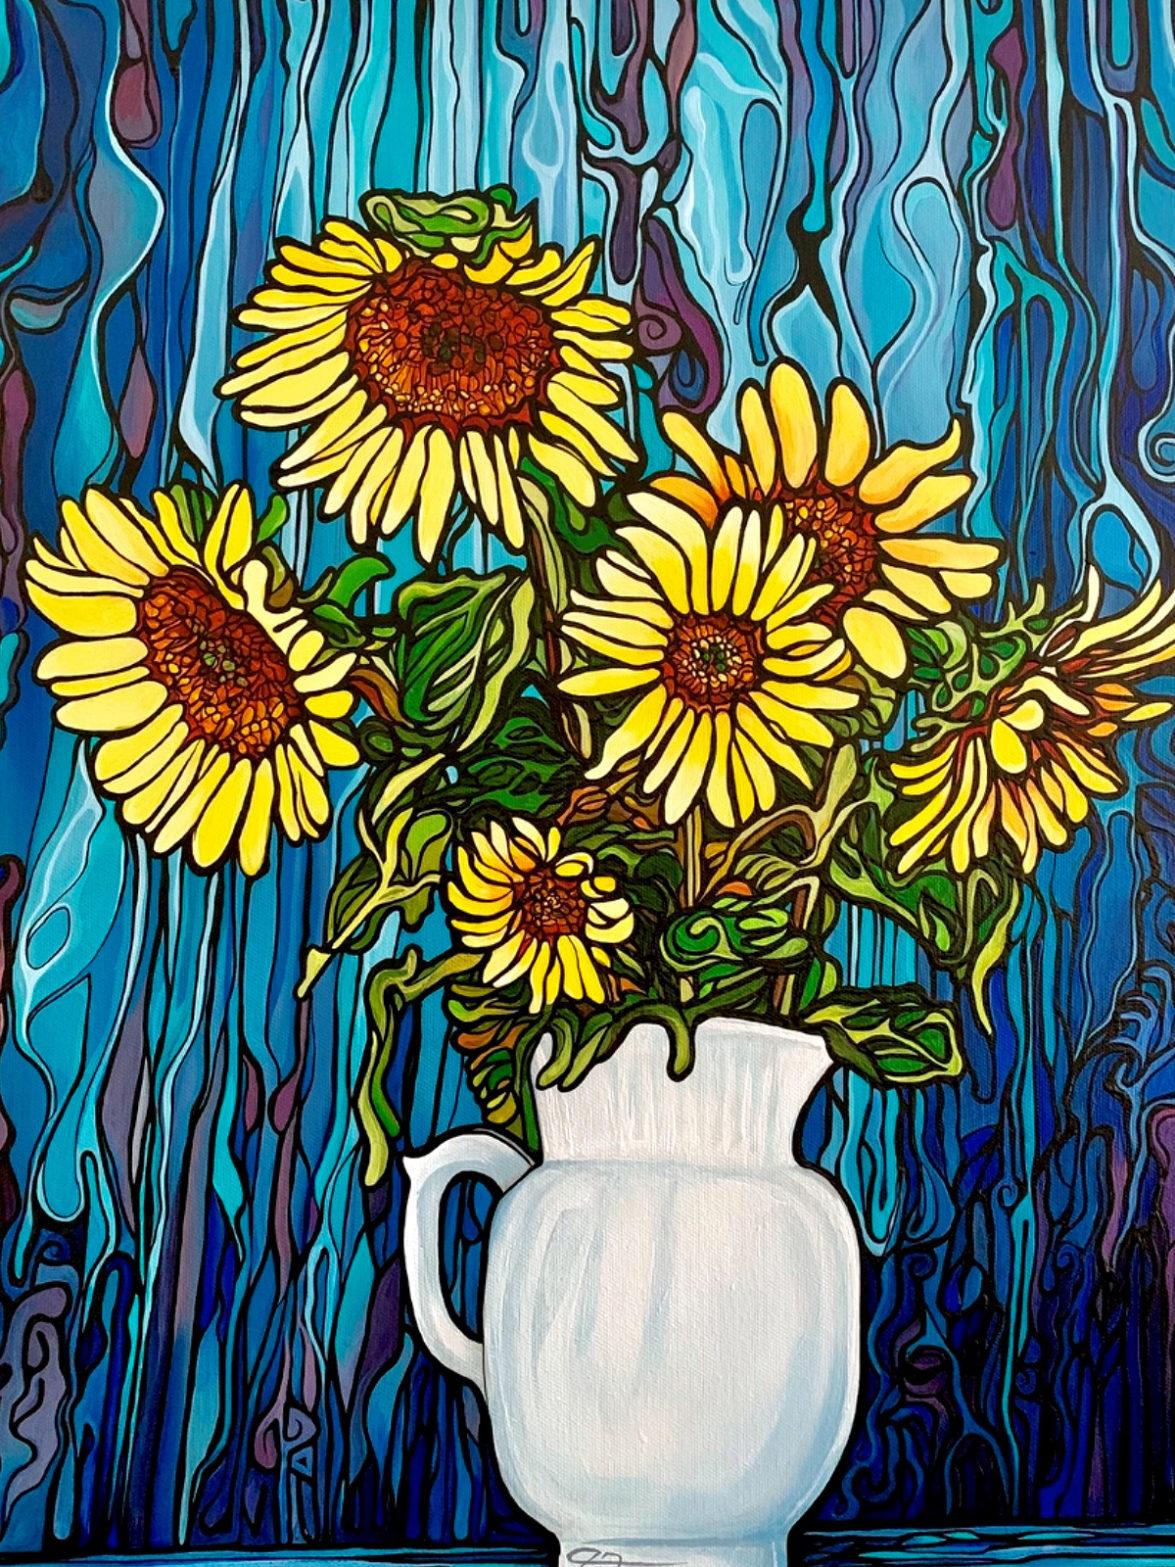 160 Sunflowers p